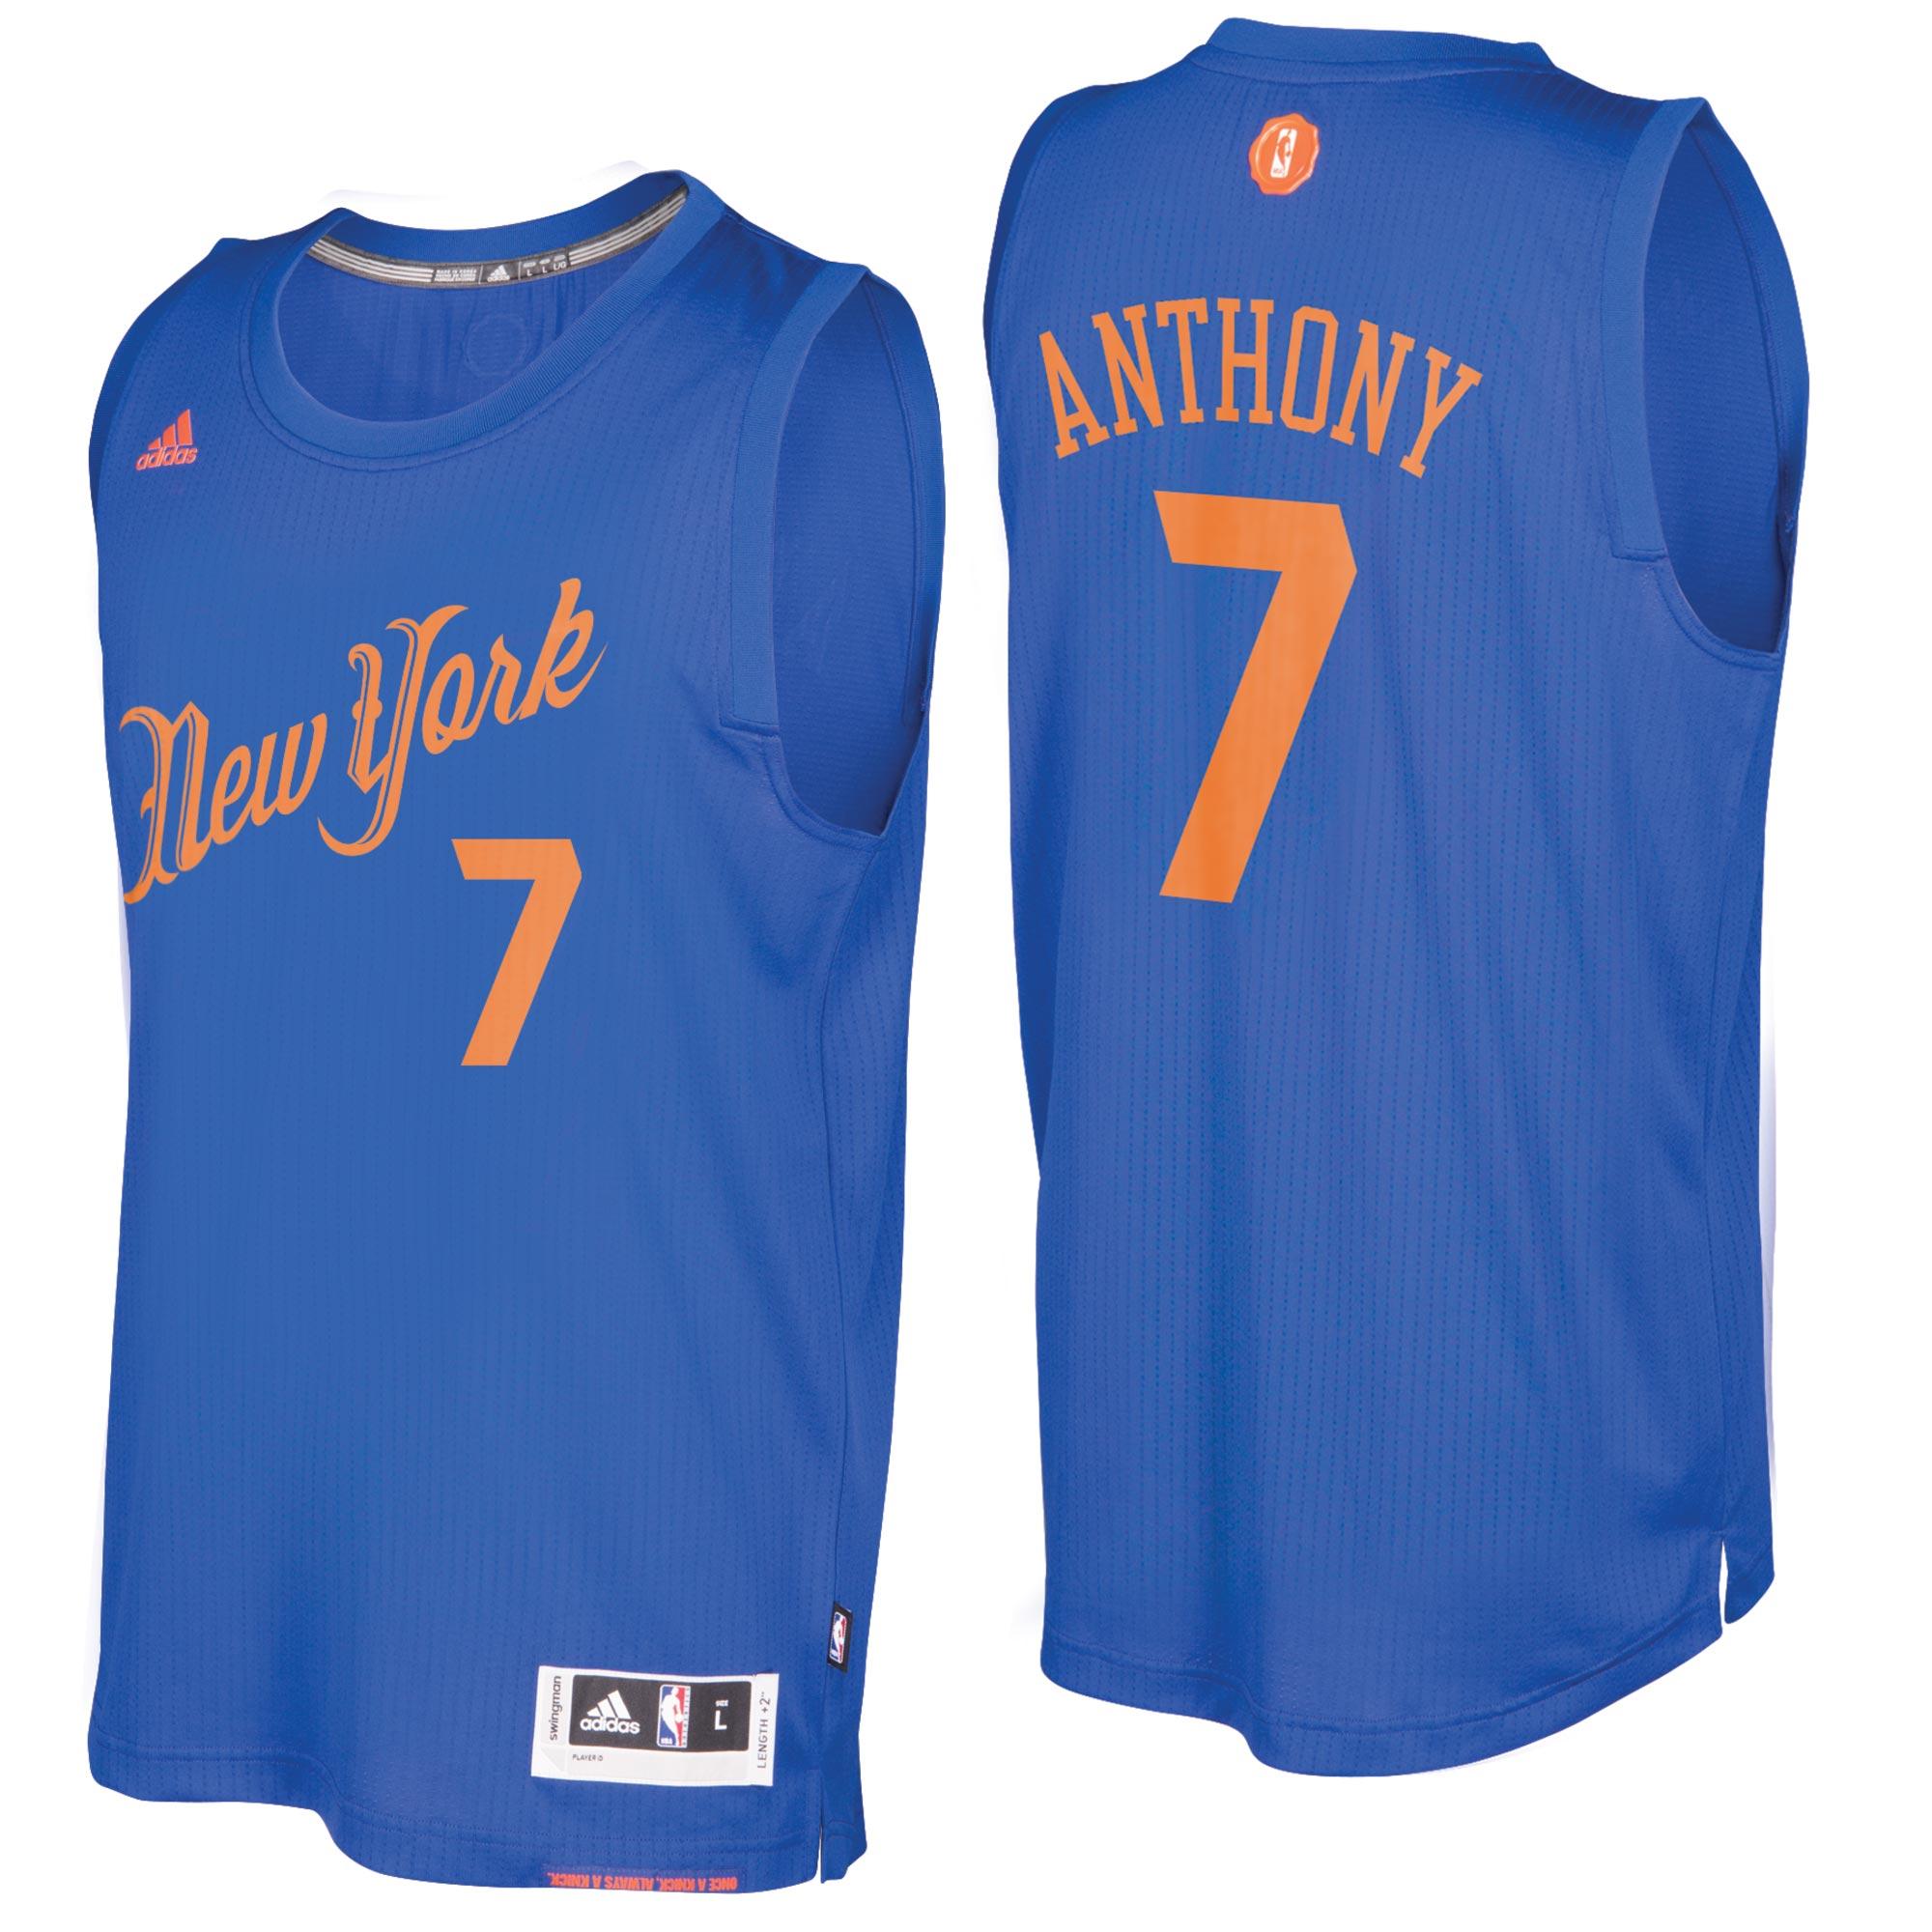 New York Knicks Christmas Day Swingman Jersey 2016 - Carmelo Anthony -